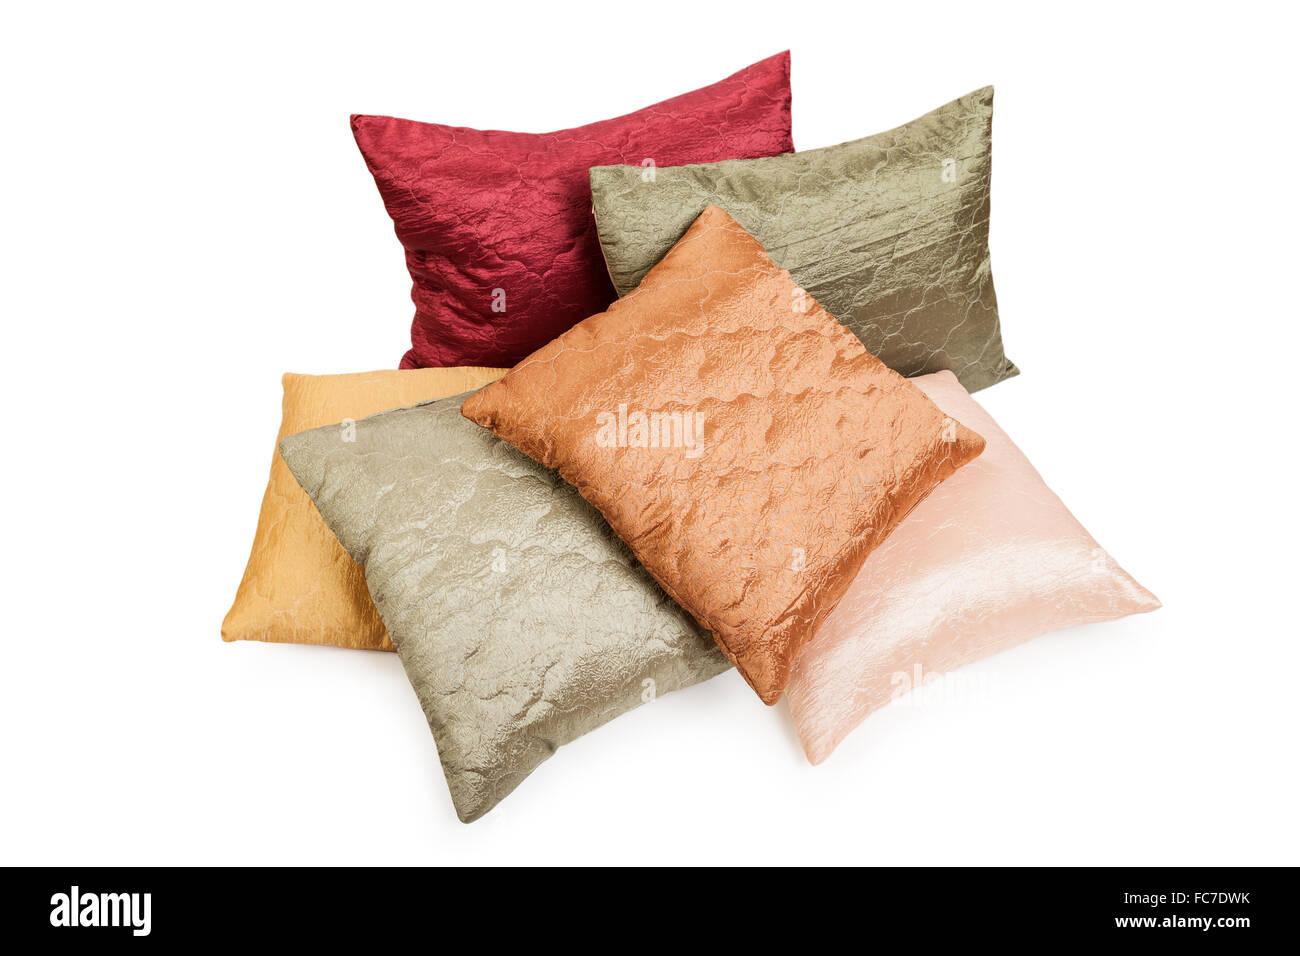 Pillow or cushion heap - Stock Image